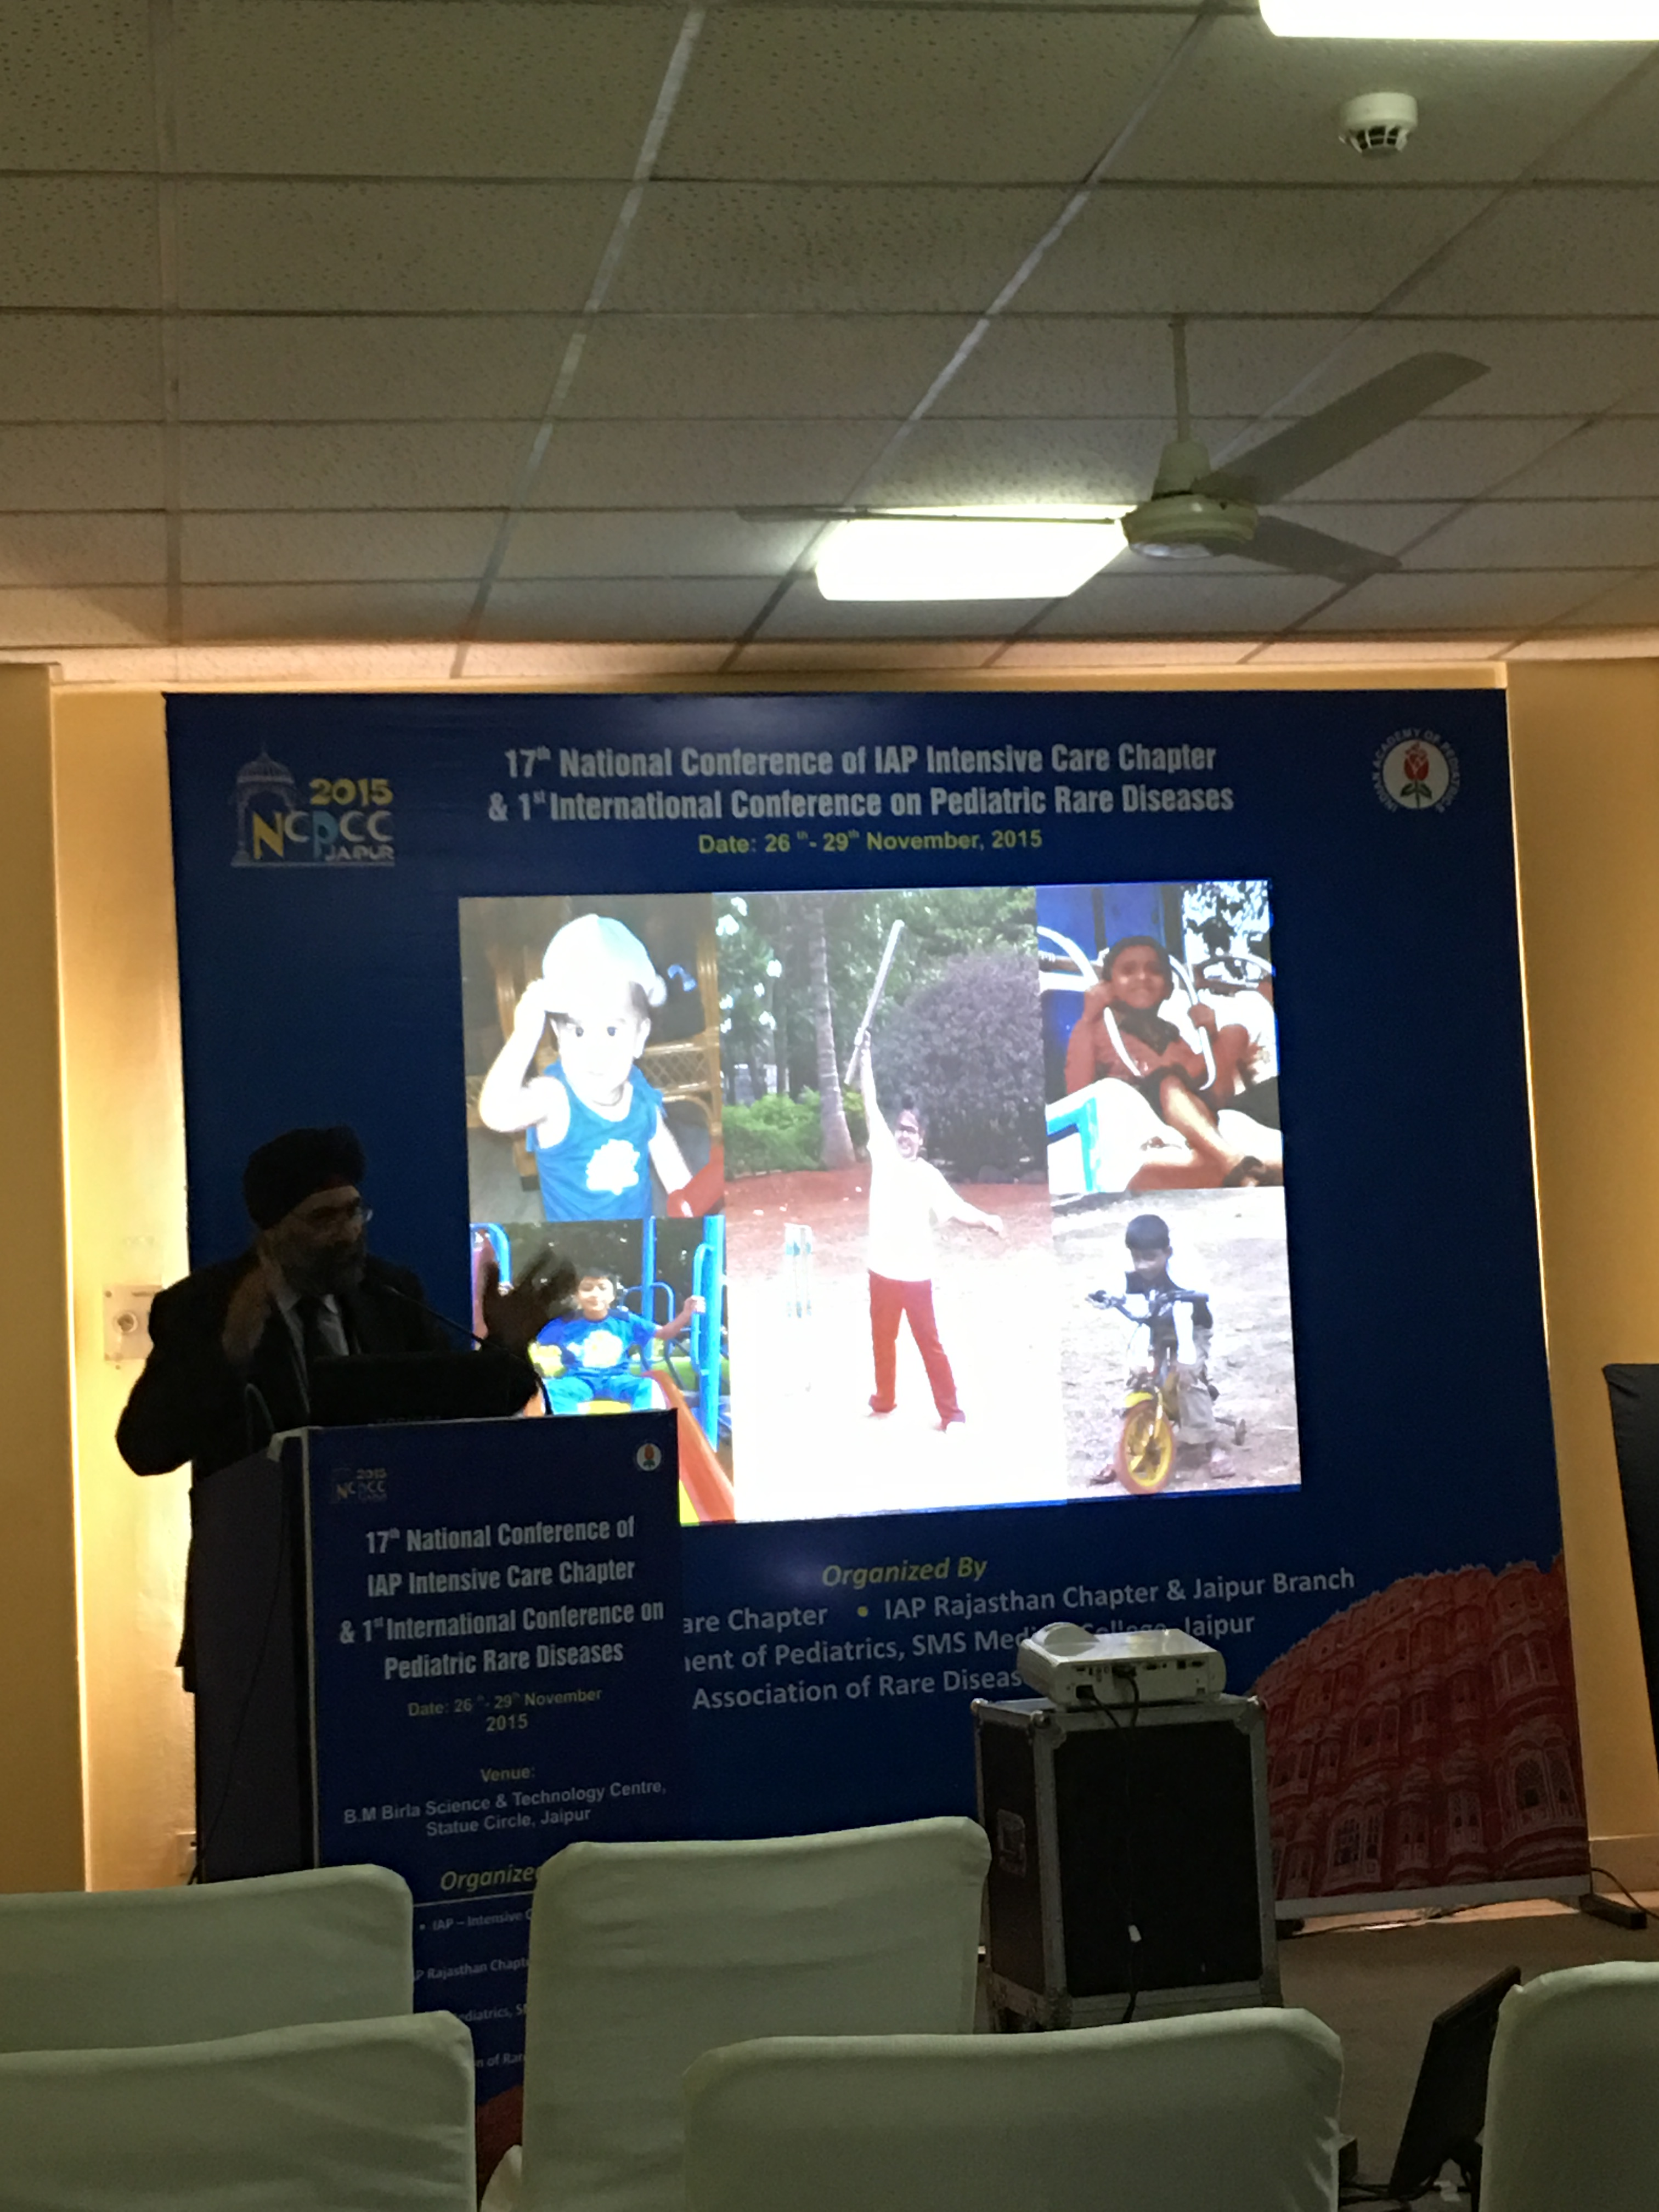 International Conference on Pediatric Rare Diseases